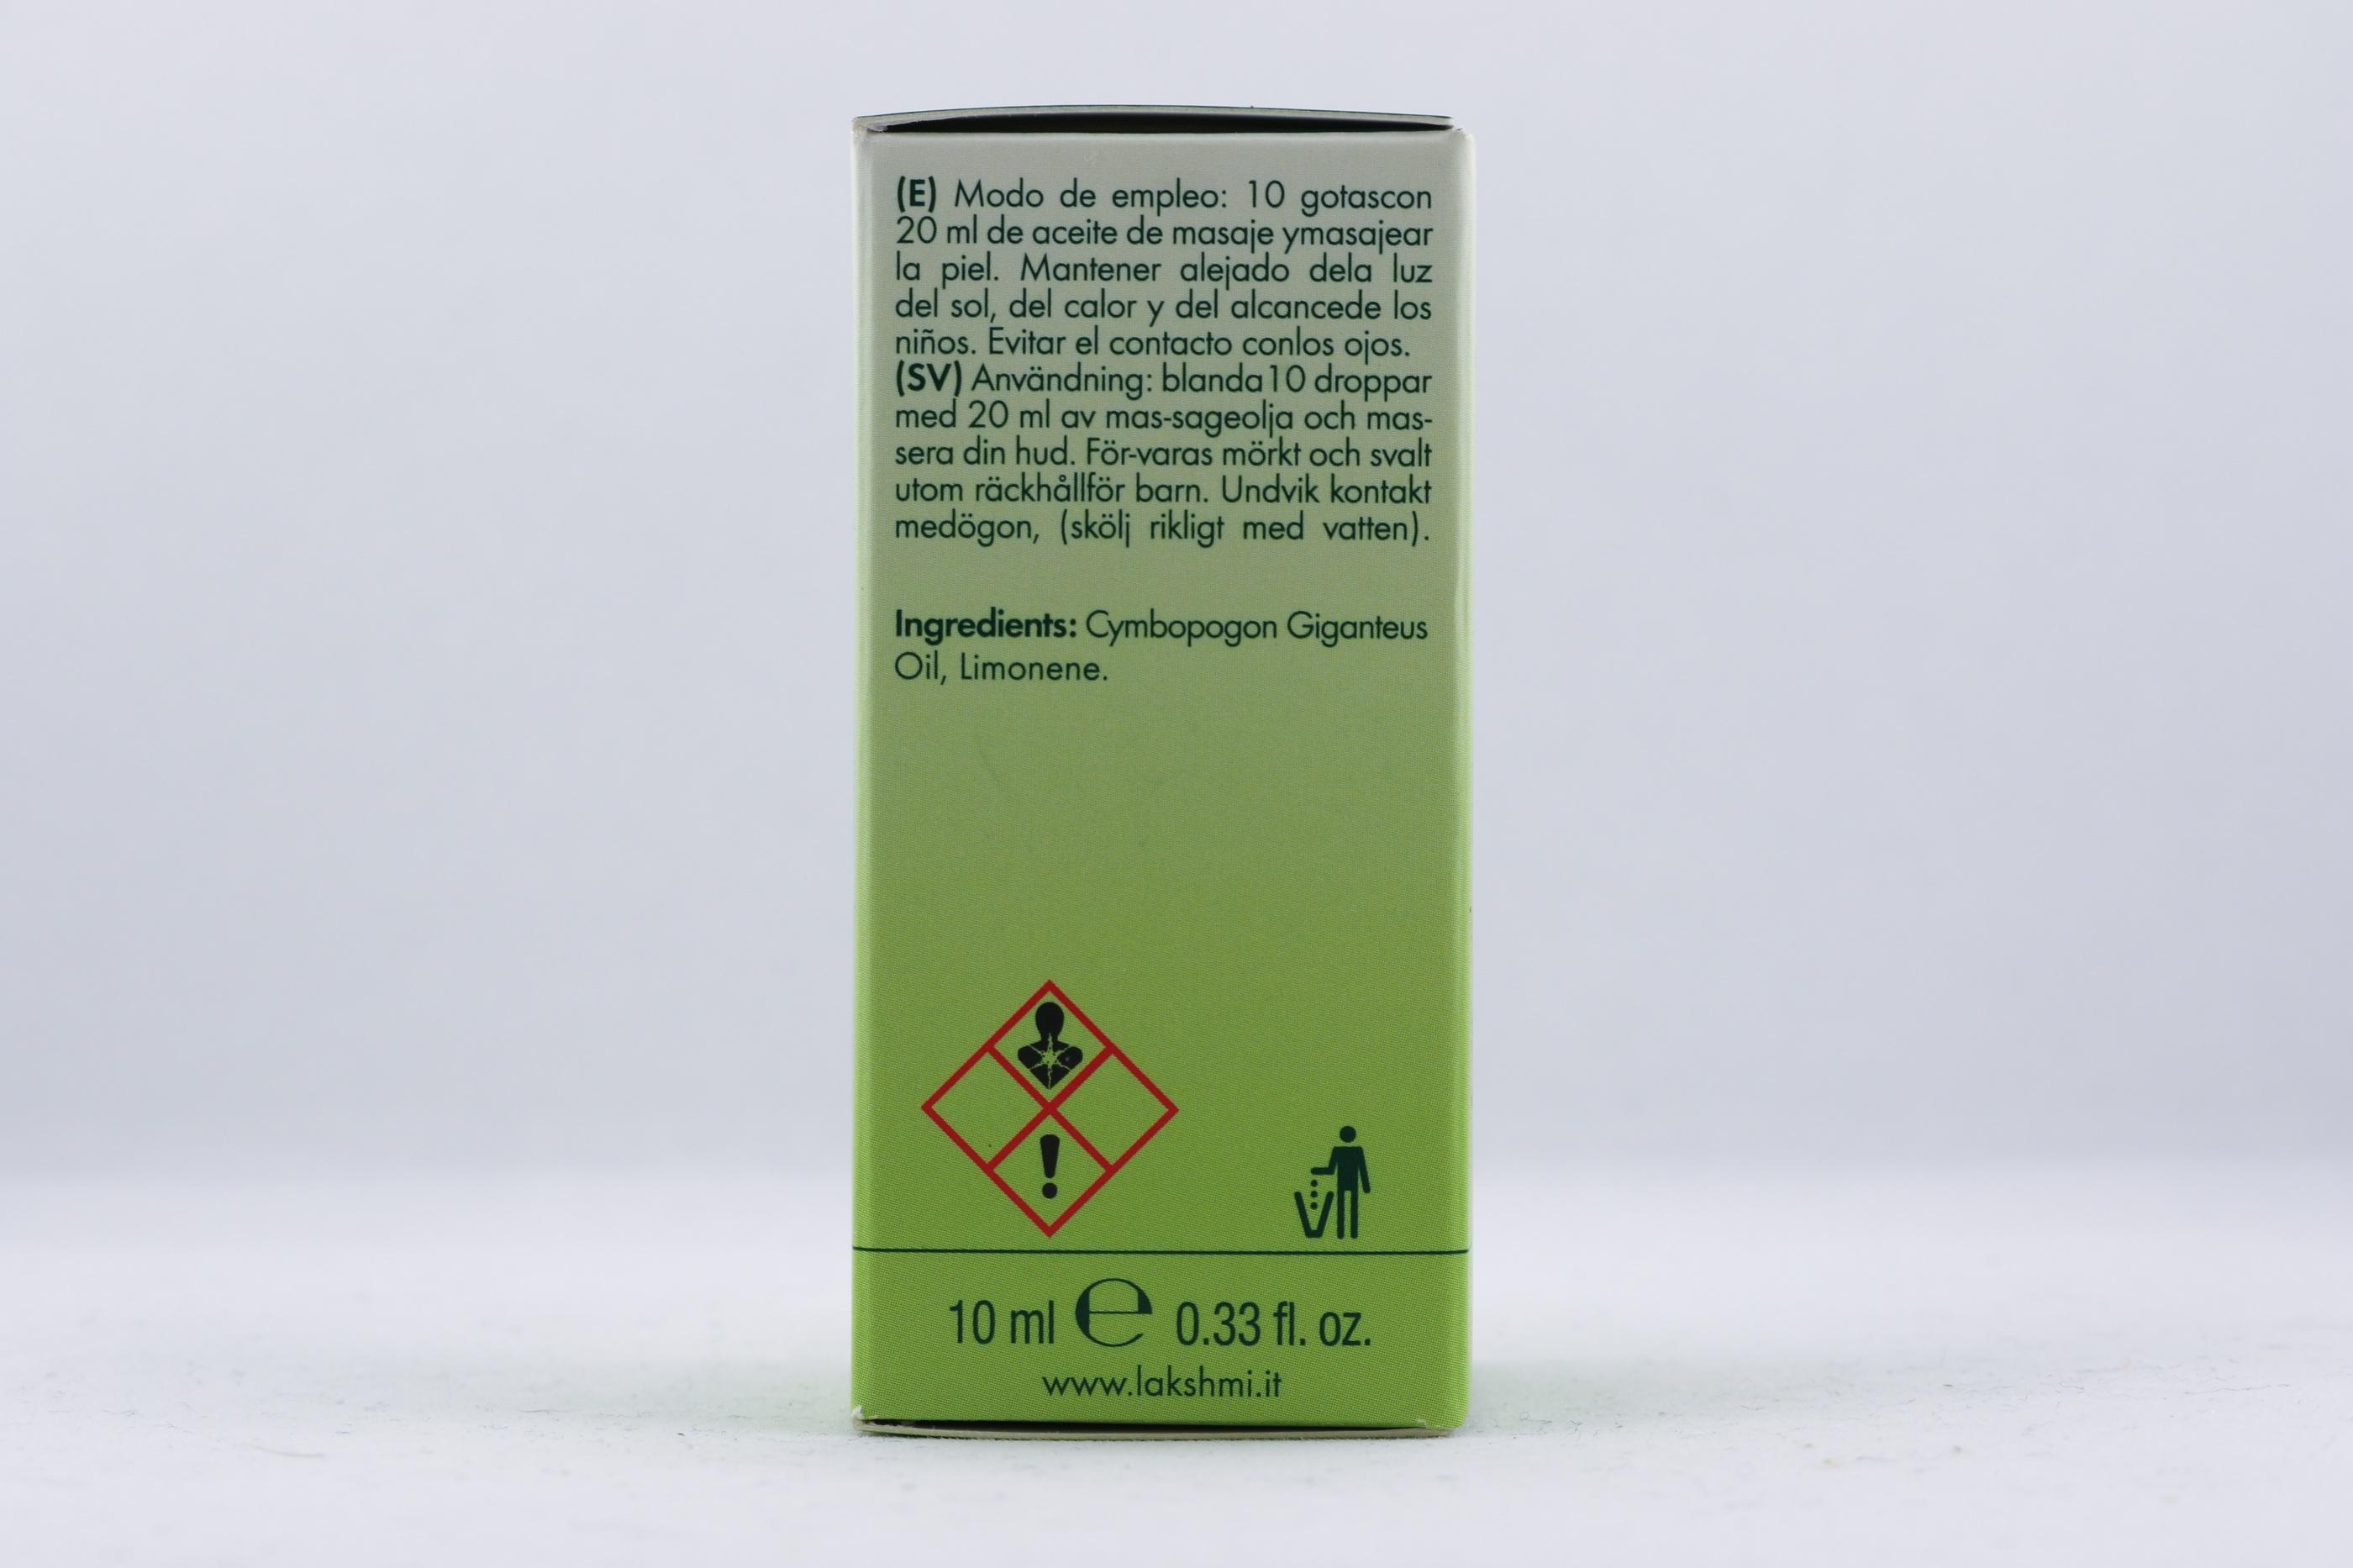 Ahibero olja wellness ayurveda halmstad sweden svensk eterisk aroma olja